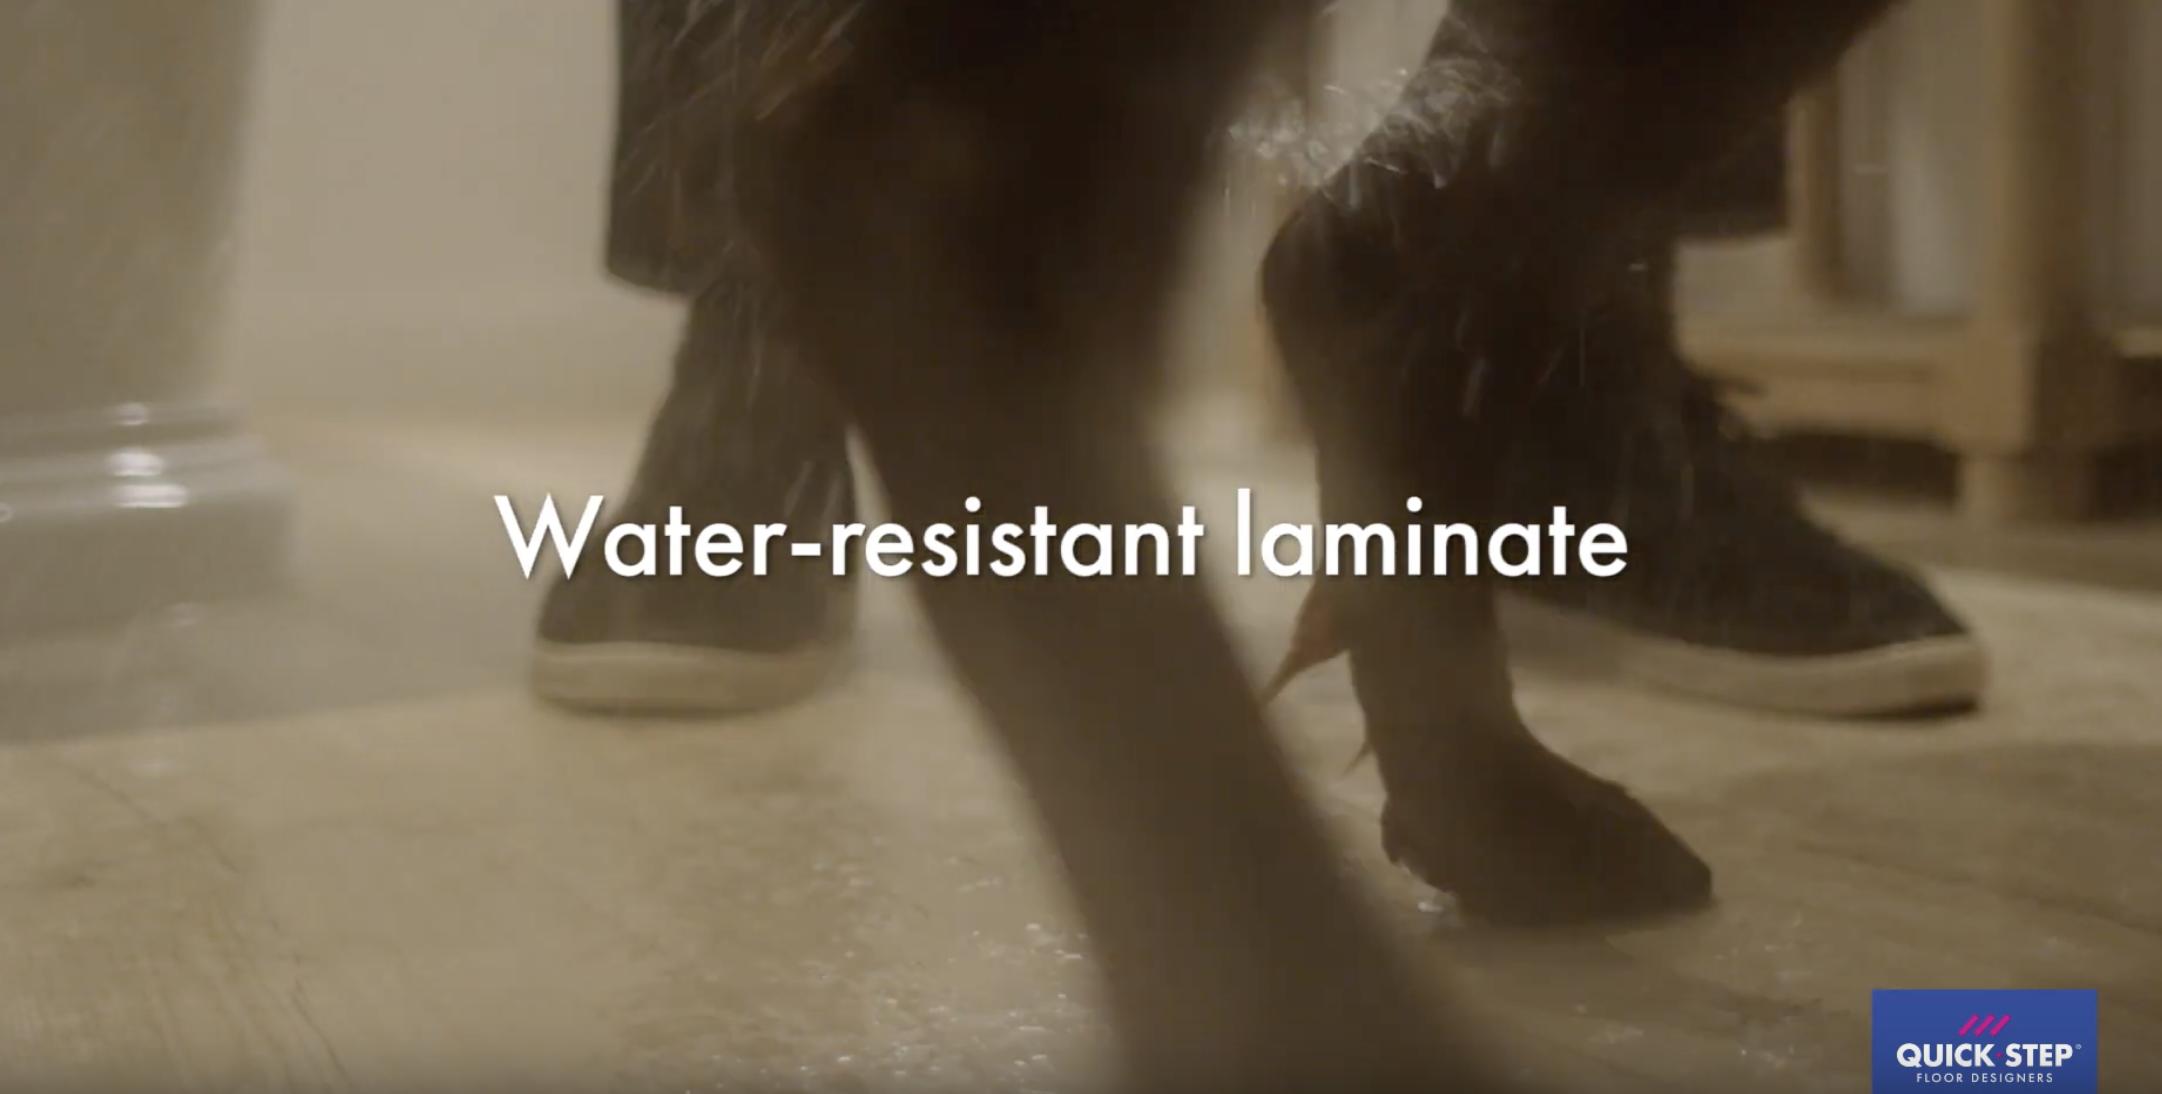 Laminate Waterresistant